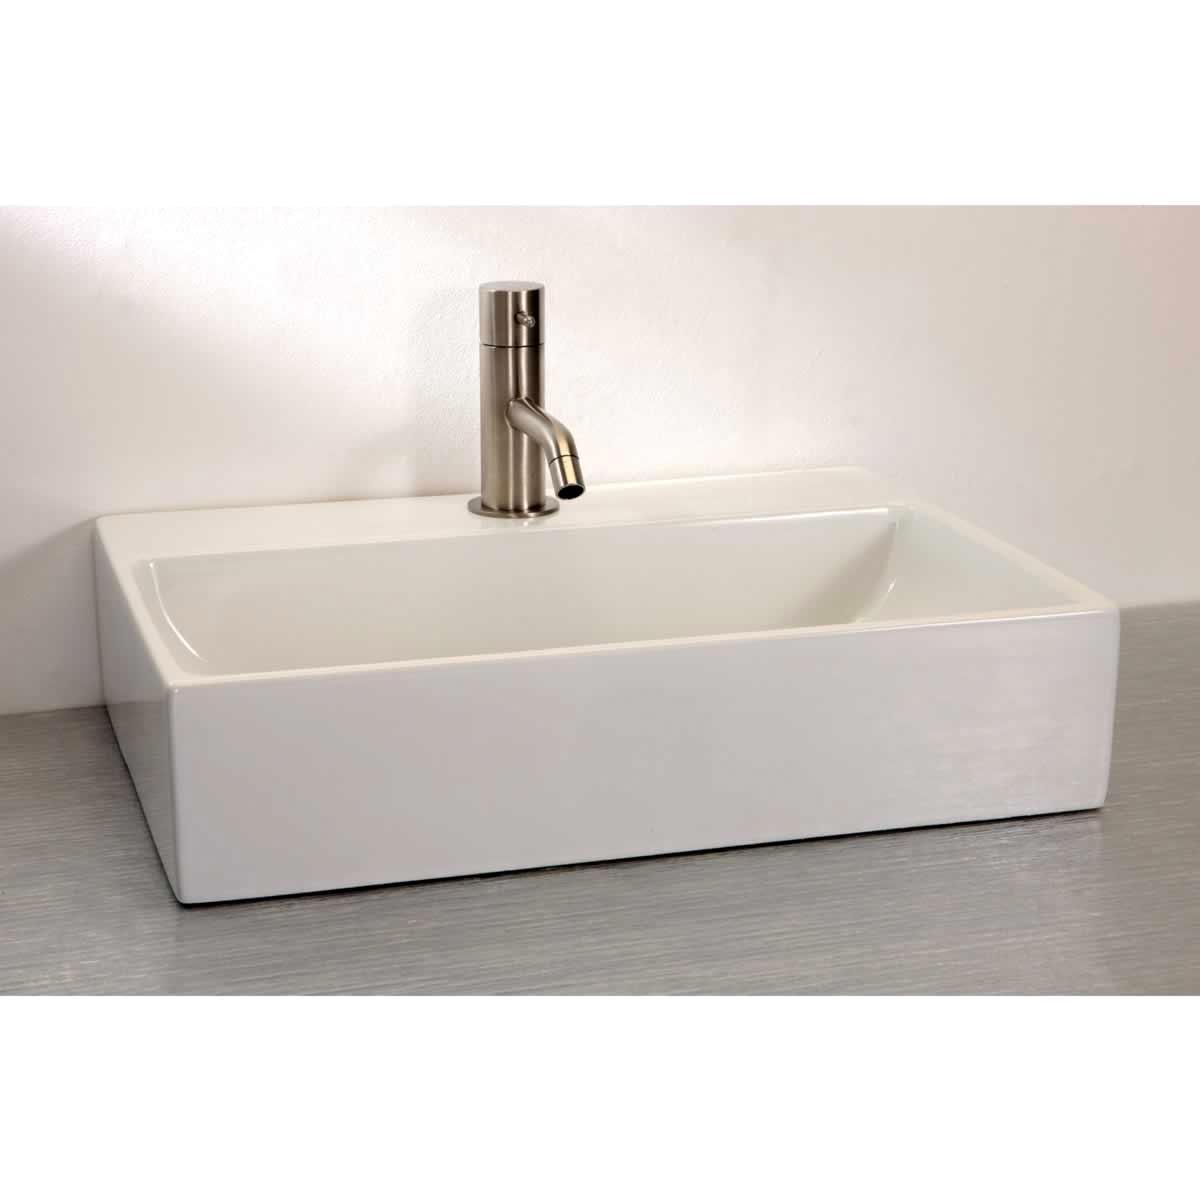 Bathroom Basin Countertop : Finwood Designs Thin Rectangular Countertop Basin : UK Bathrooms